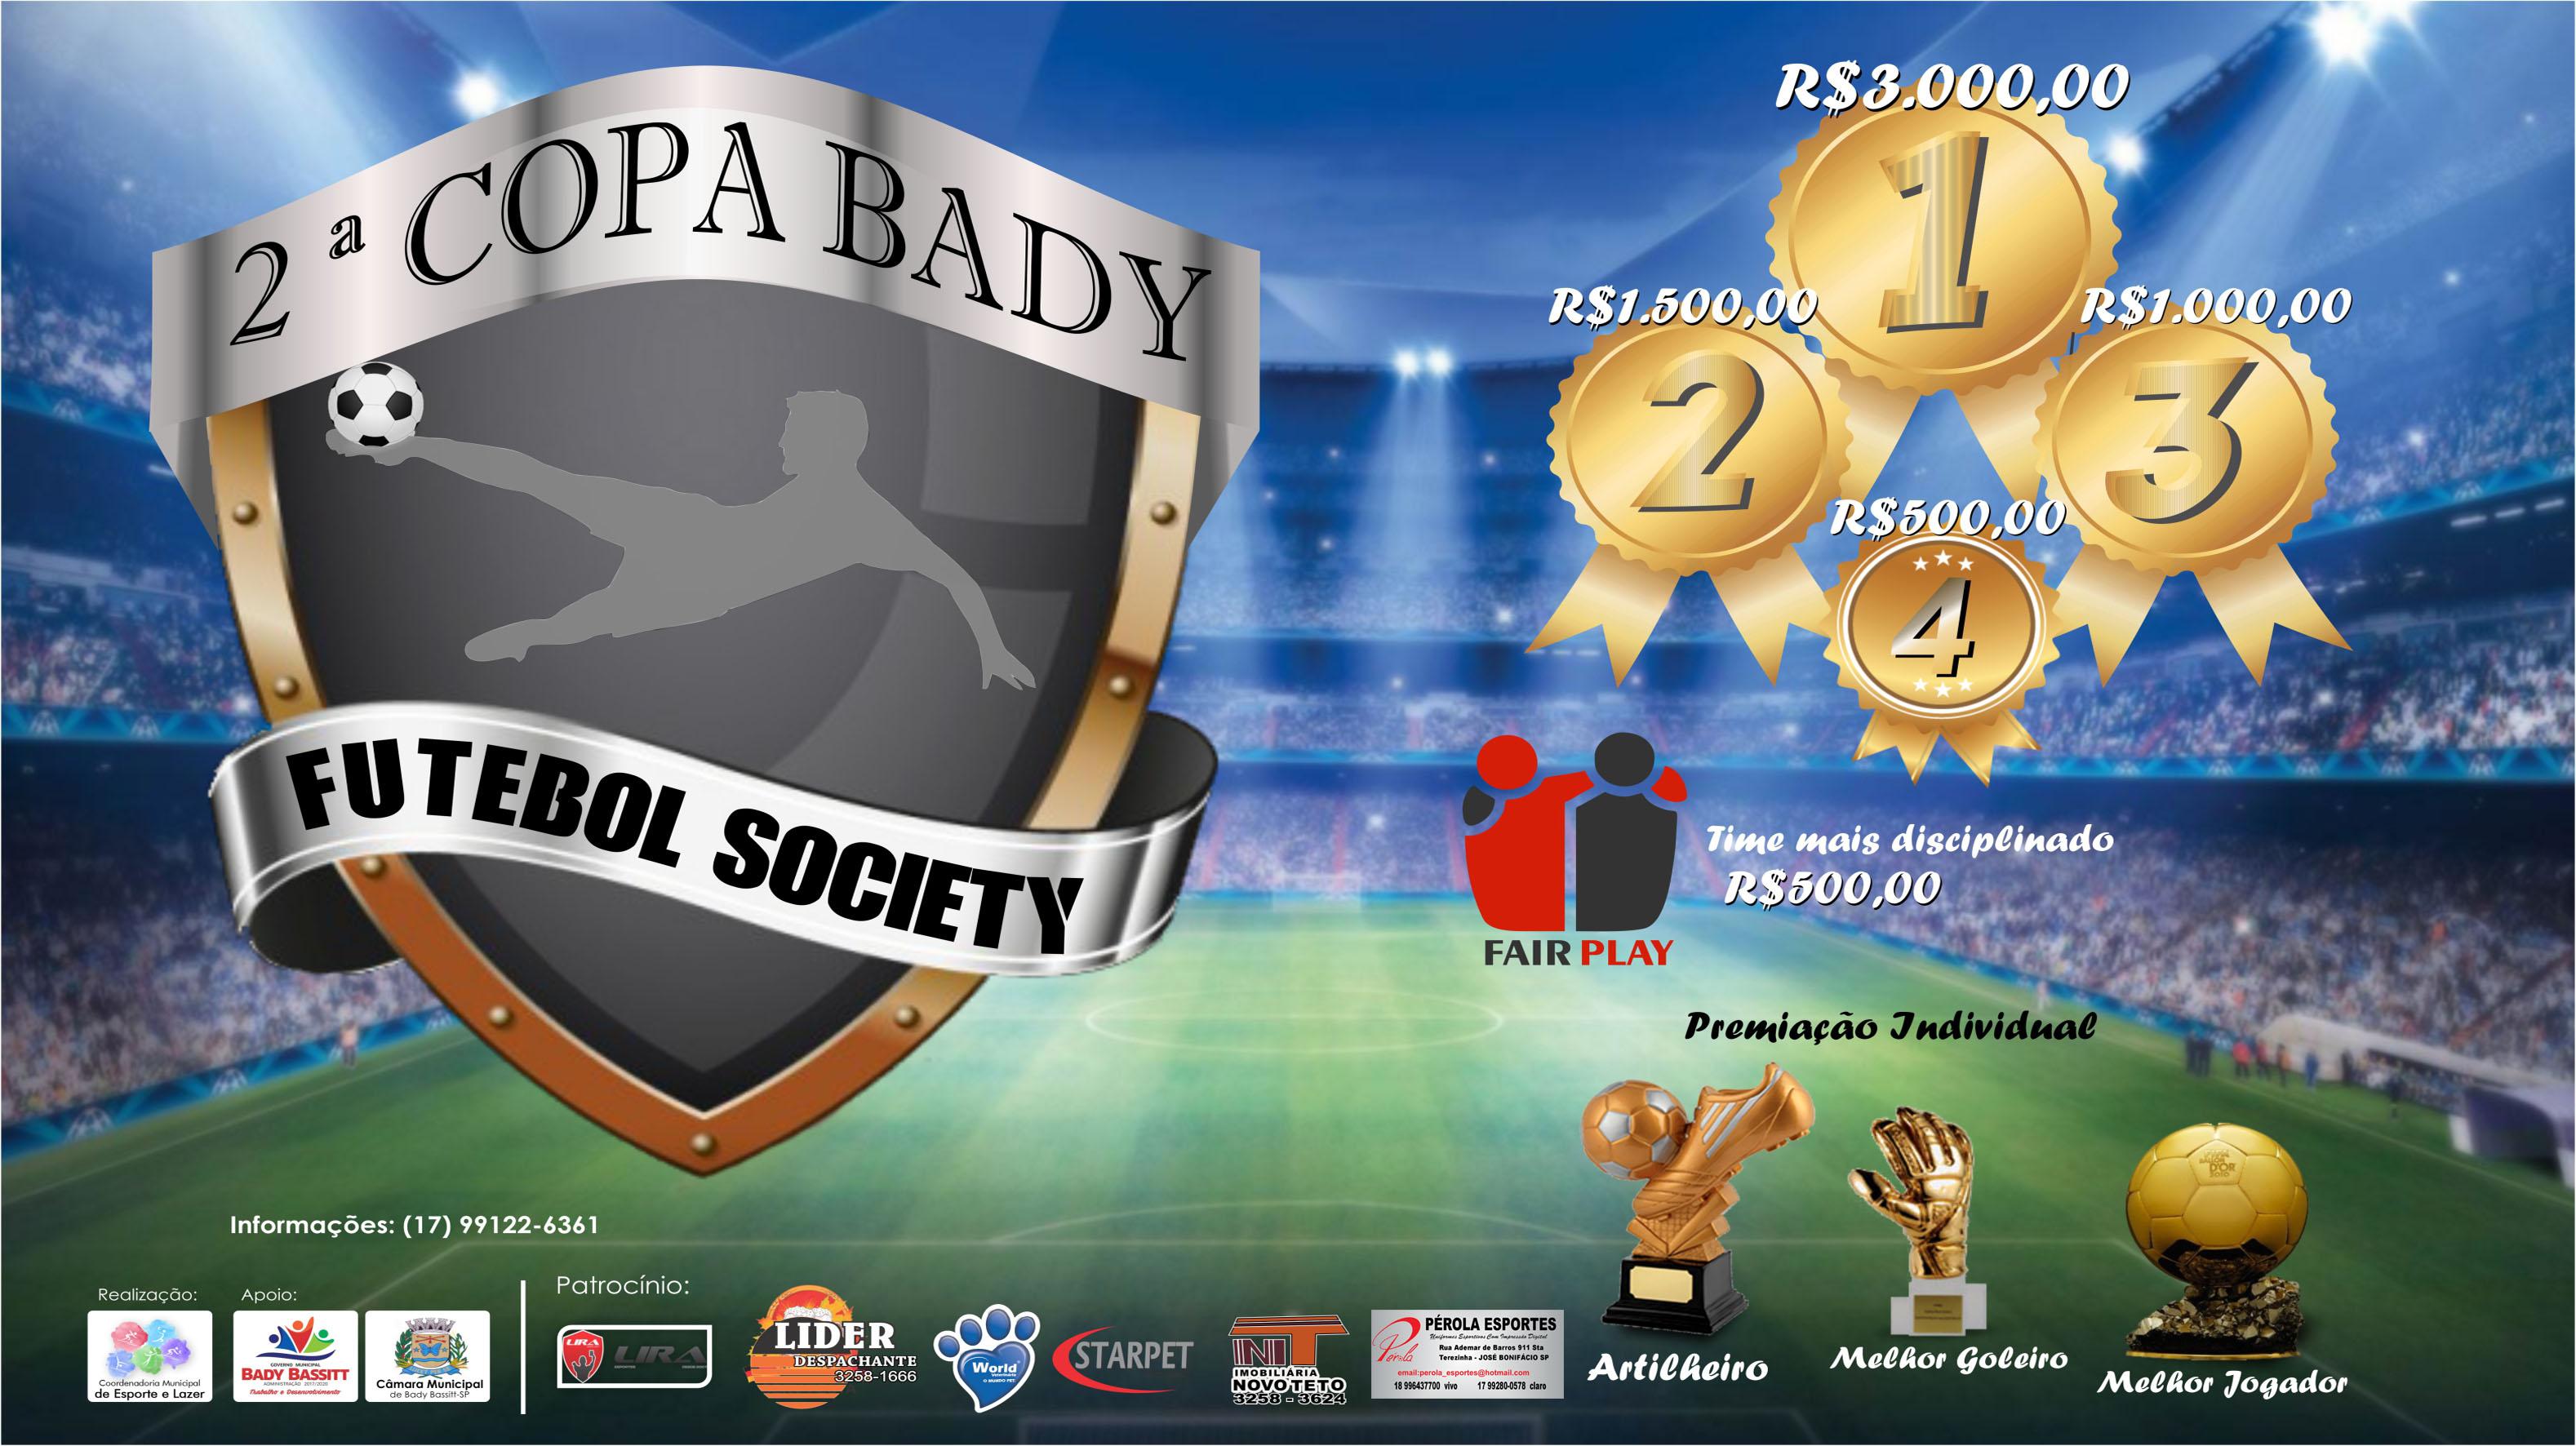 2ª Copa Bady de Society